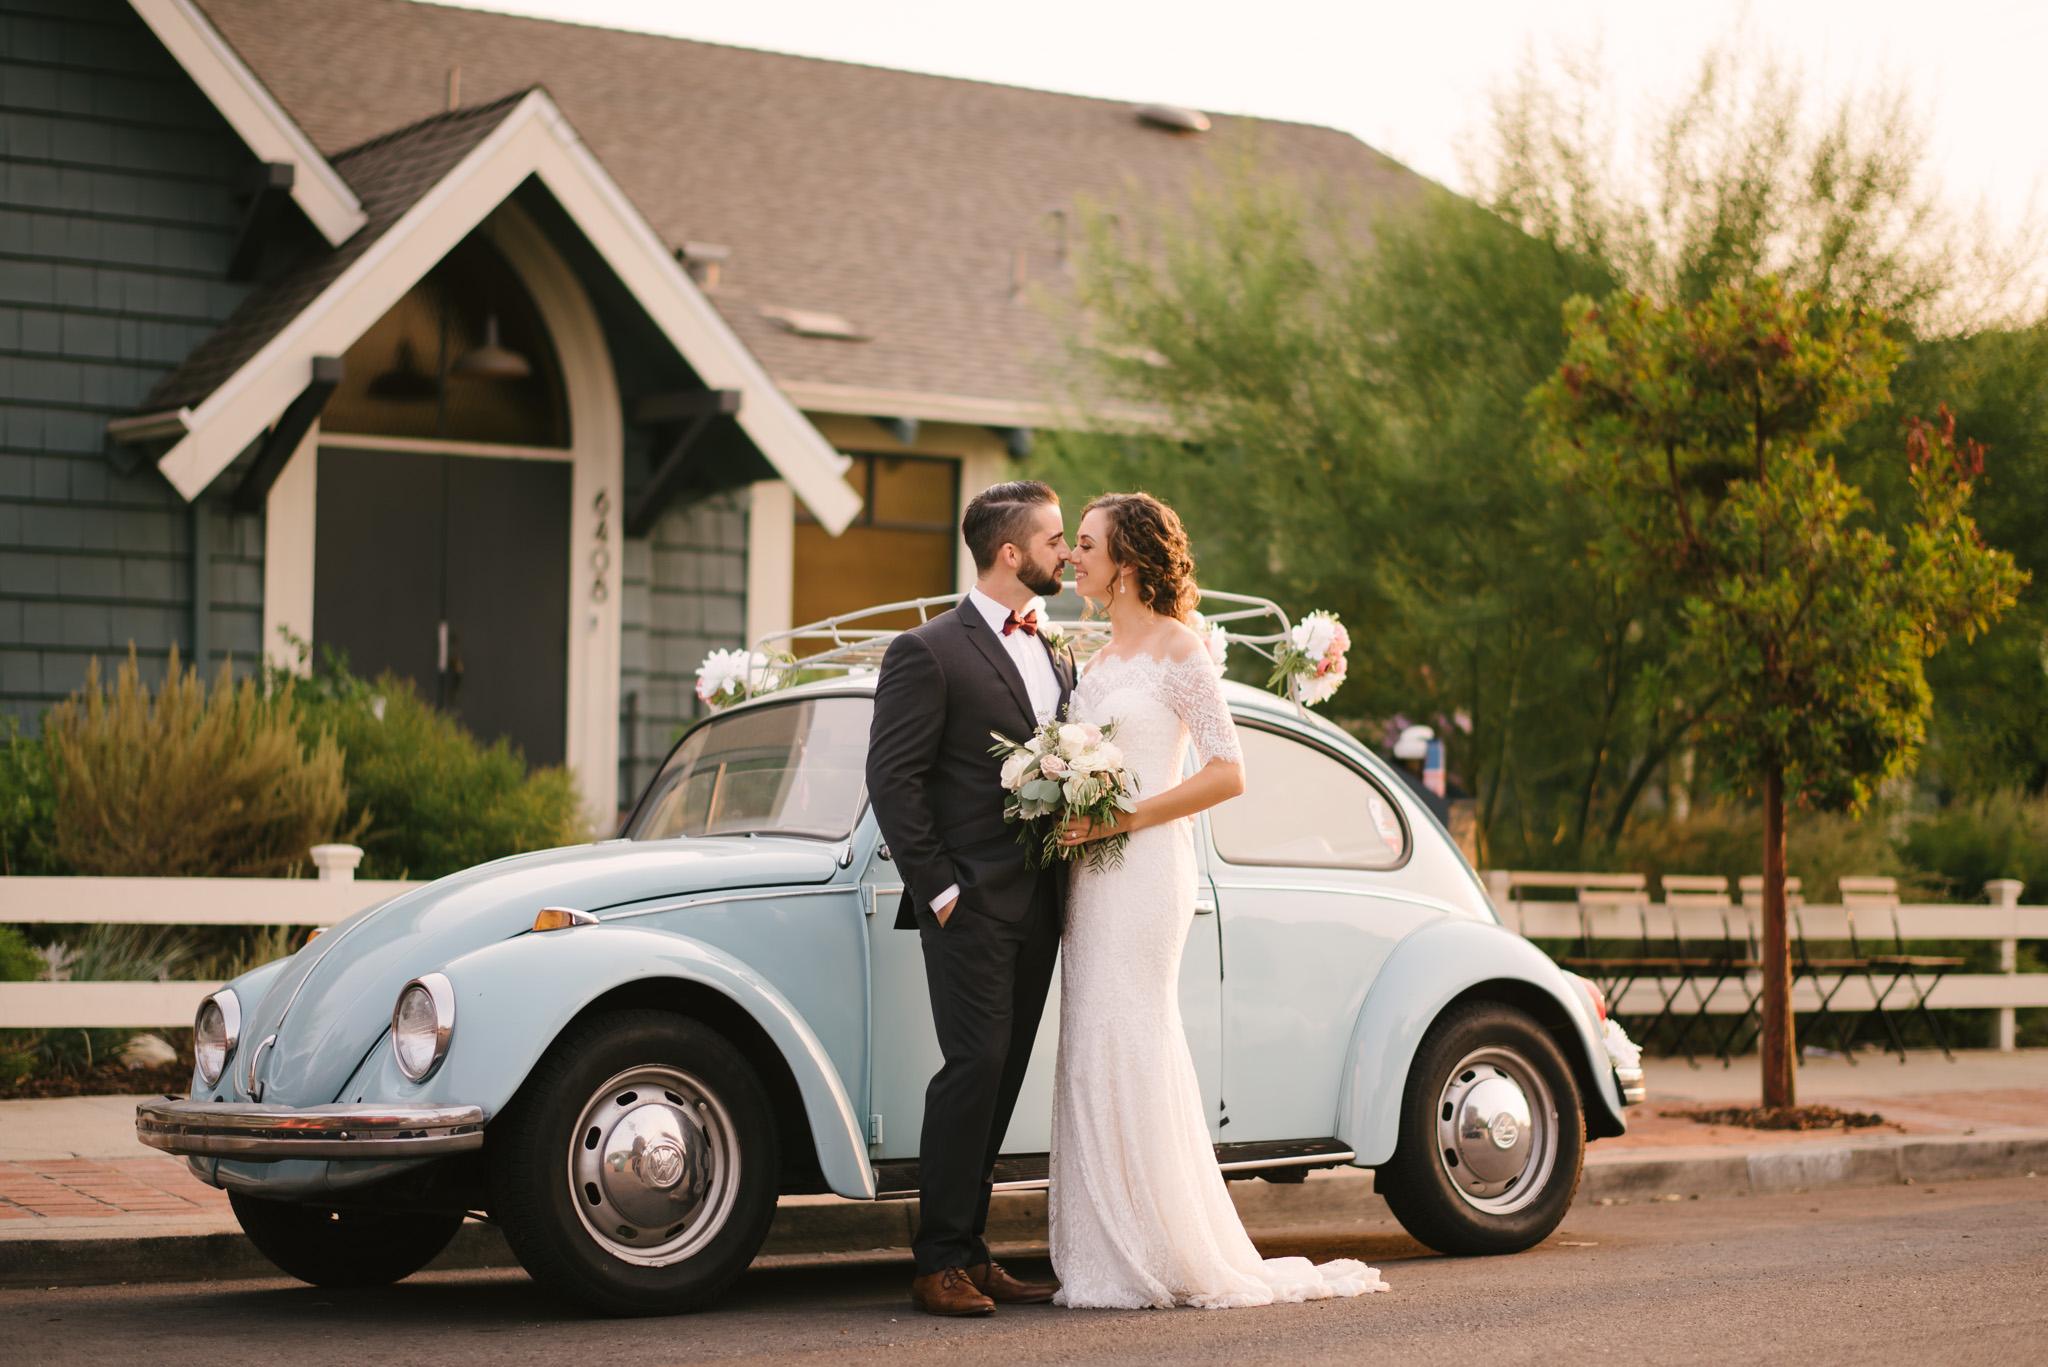 0528-LJ-The-Ruby-Street-Los-Angeles-County-Wedding-Photography.jpg